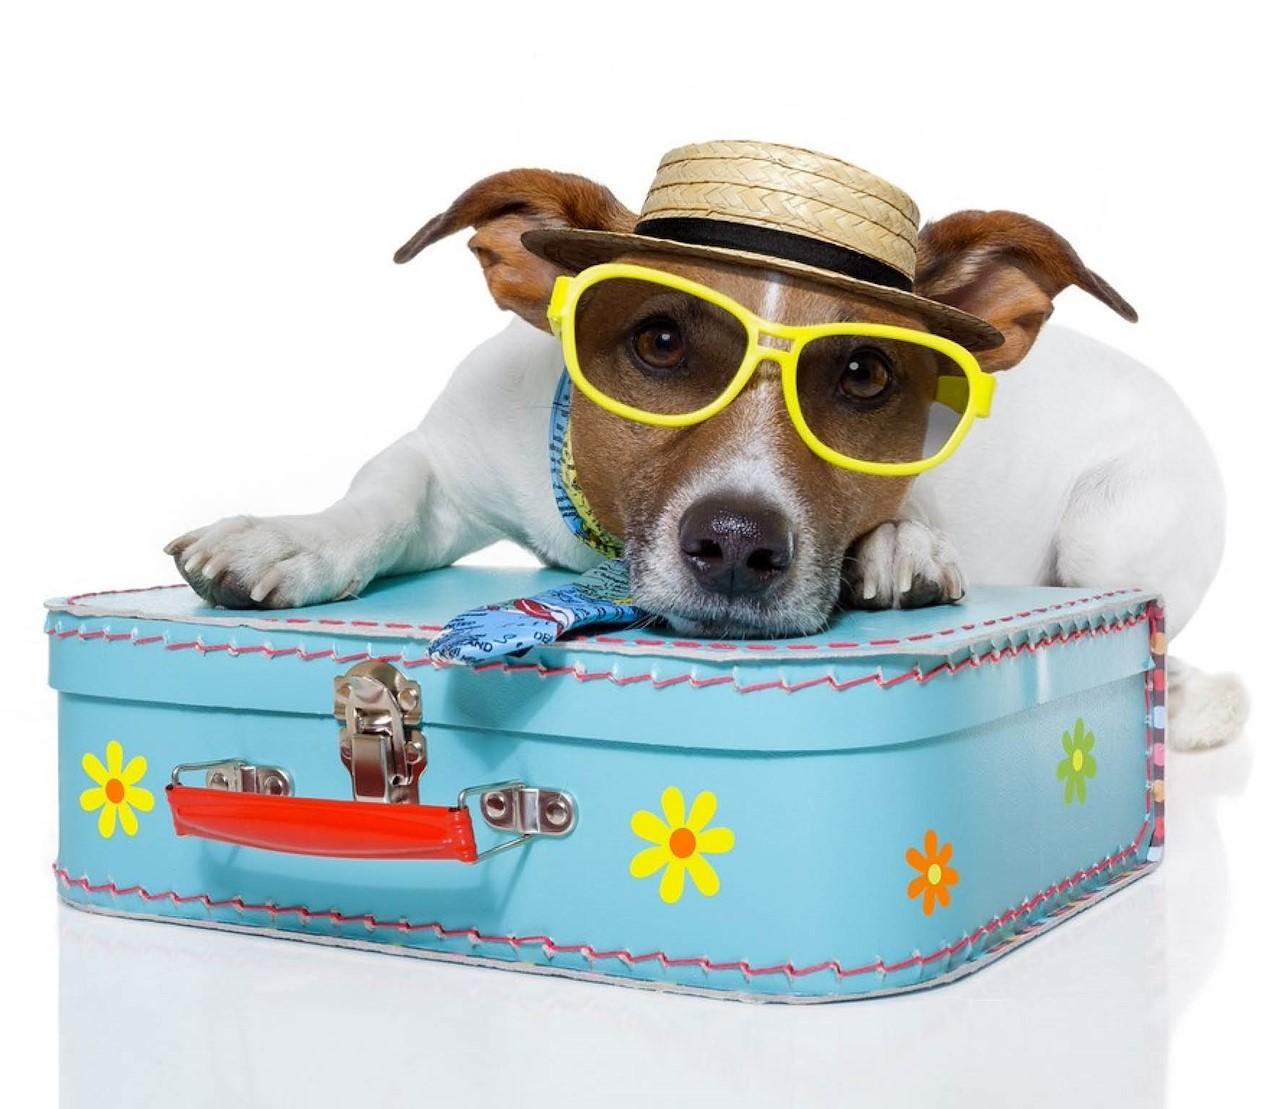 Je huisdier mee op reis, of niet?